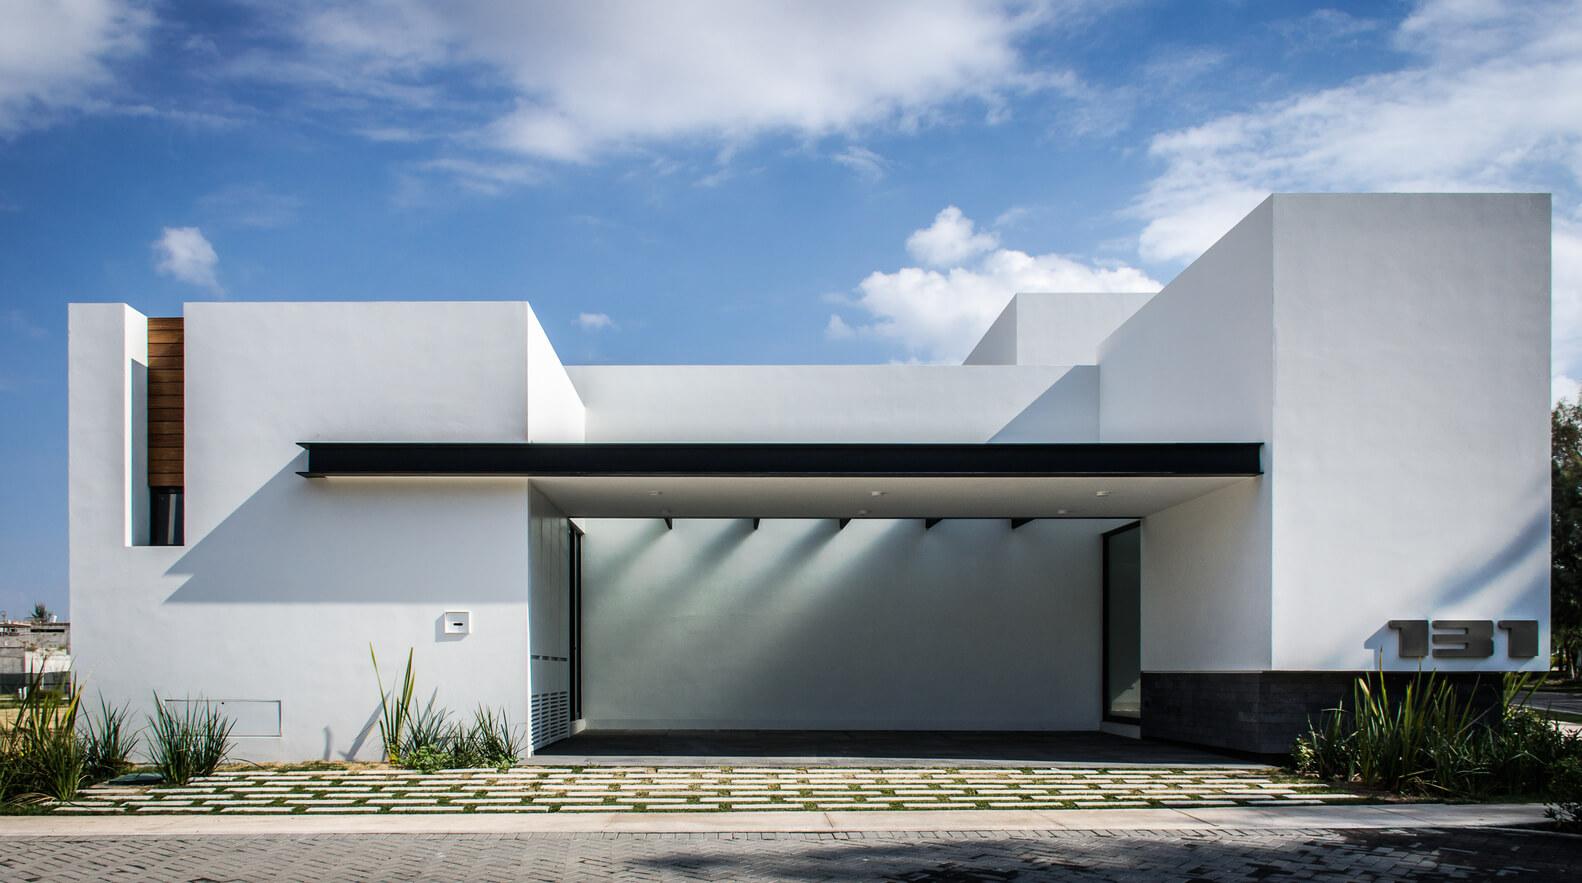 16 fachadas modernas diganas de imitar interiores - Fachadas arquitectura ...